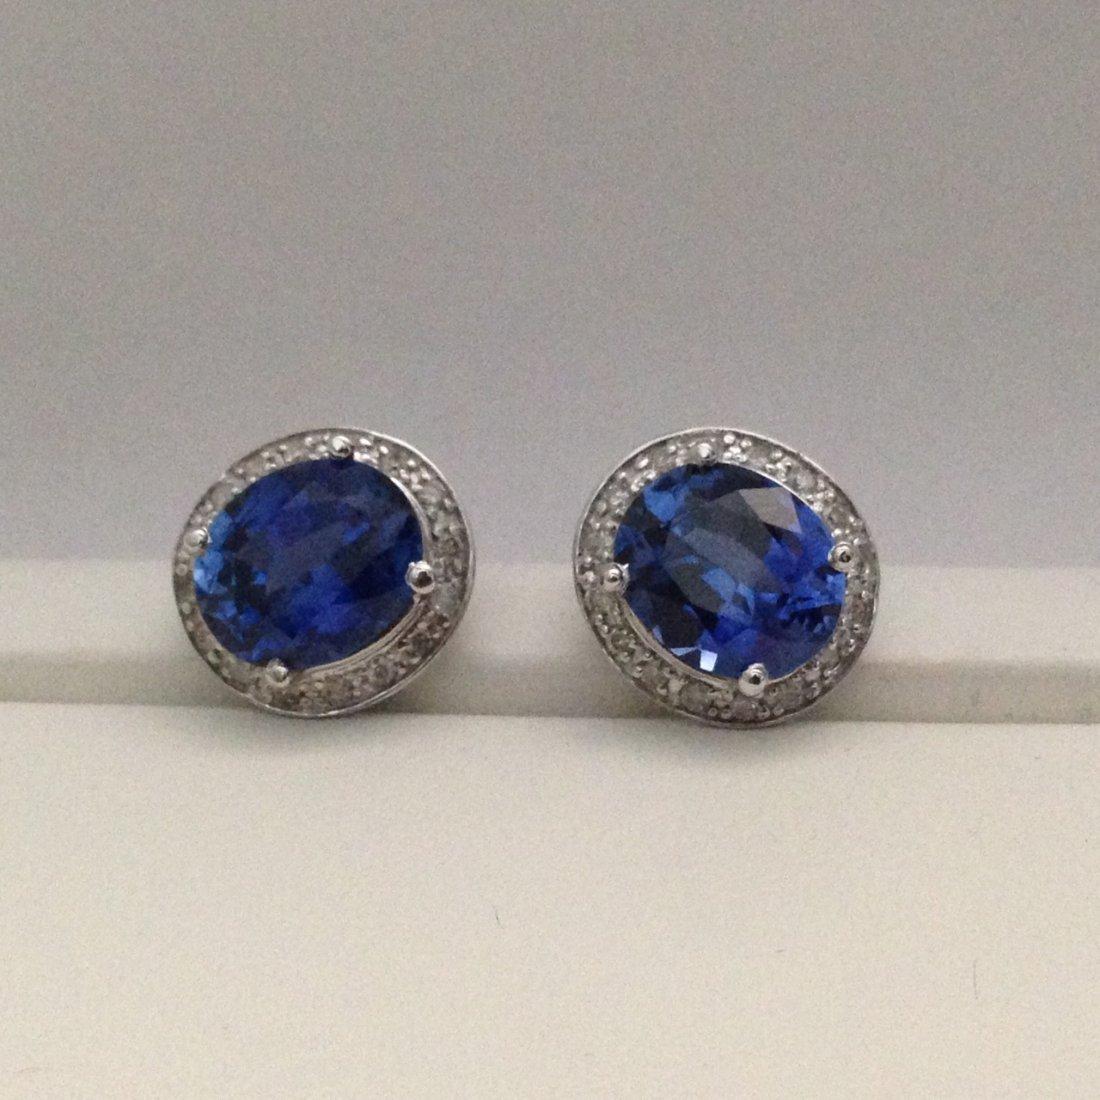 14K White Gold Blue Sapphire And Diamond Earrings/STUDS